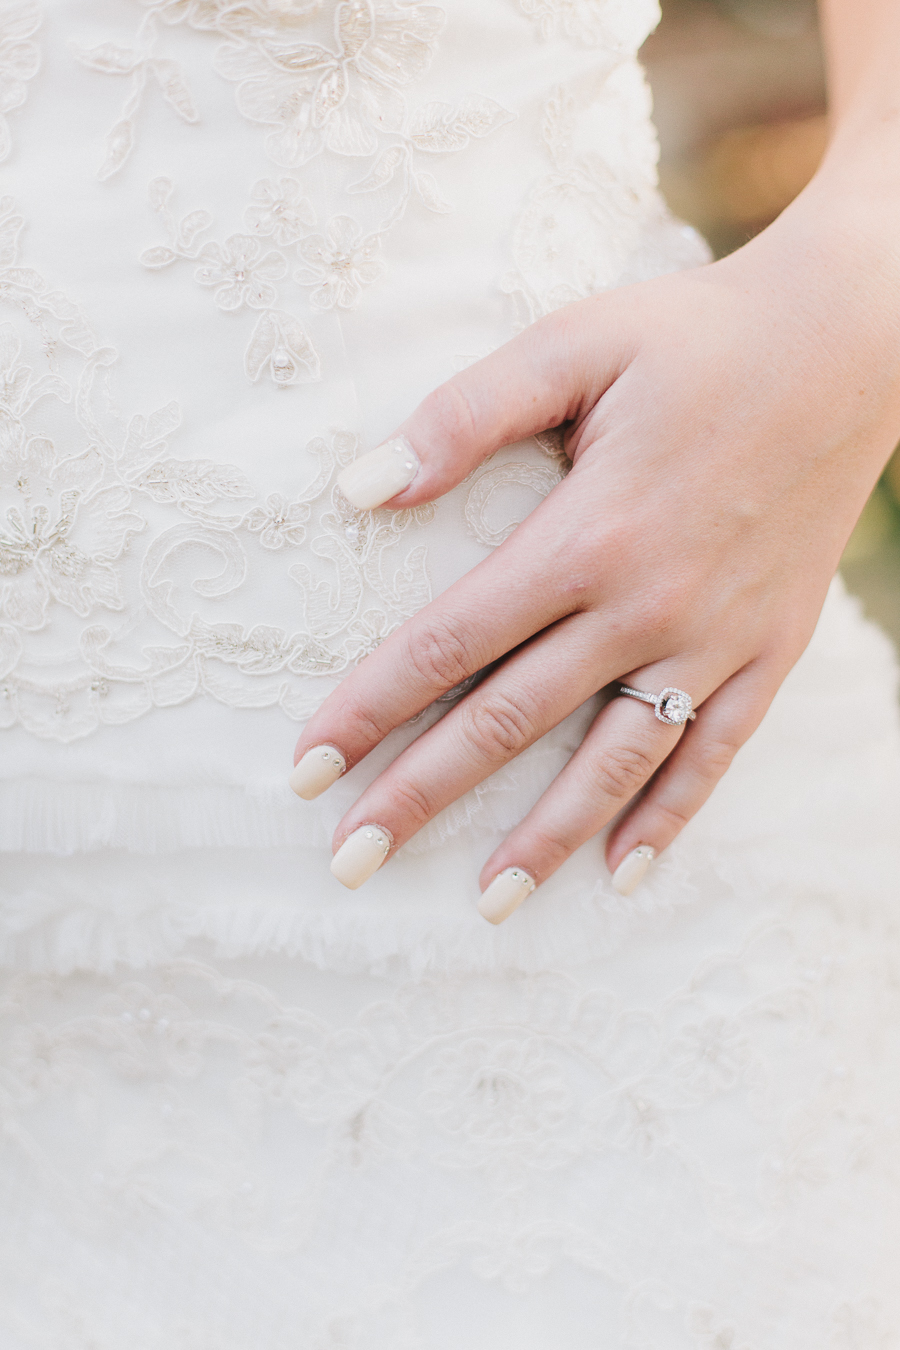 wedding, bride, bridal, details, wedding ring, ring, fort valley, massee lane, garden, georgia, macon, wedding photography